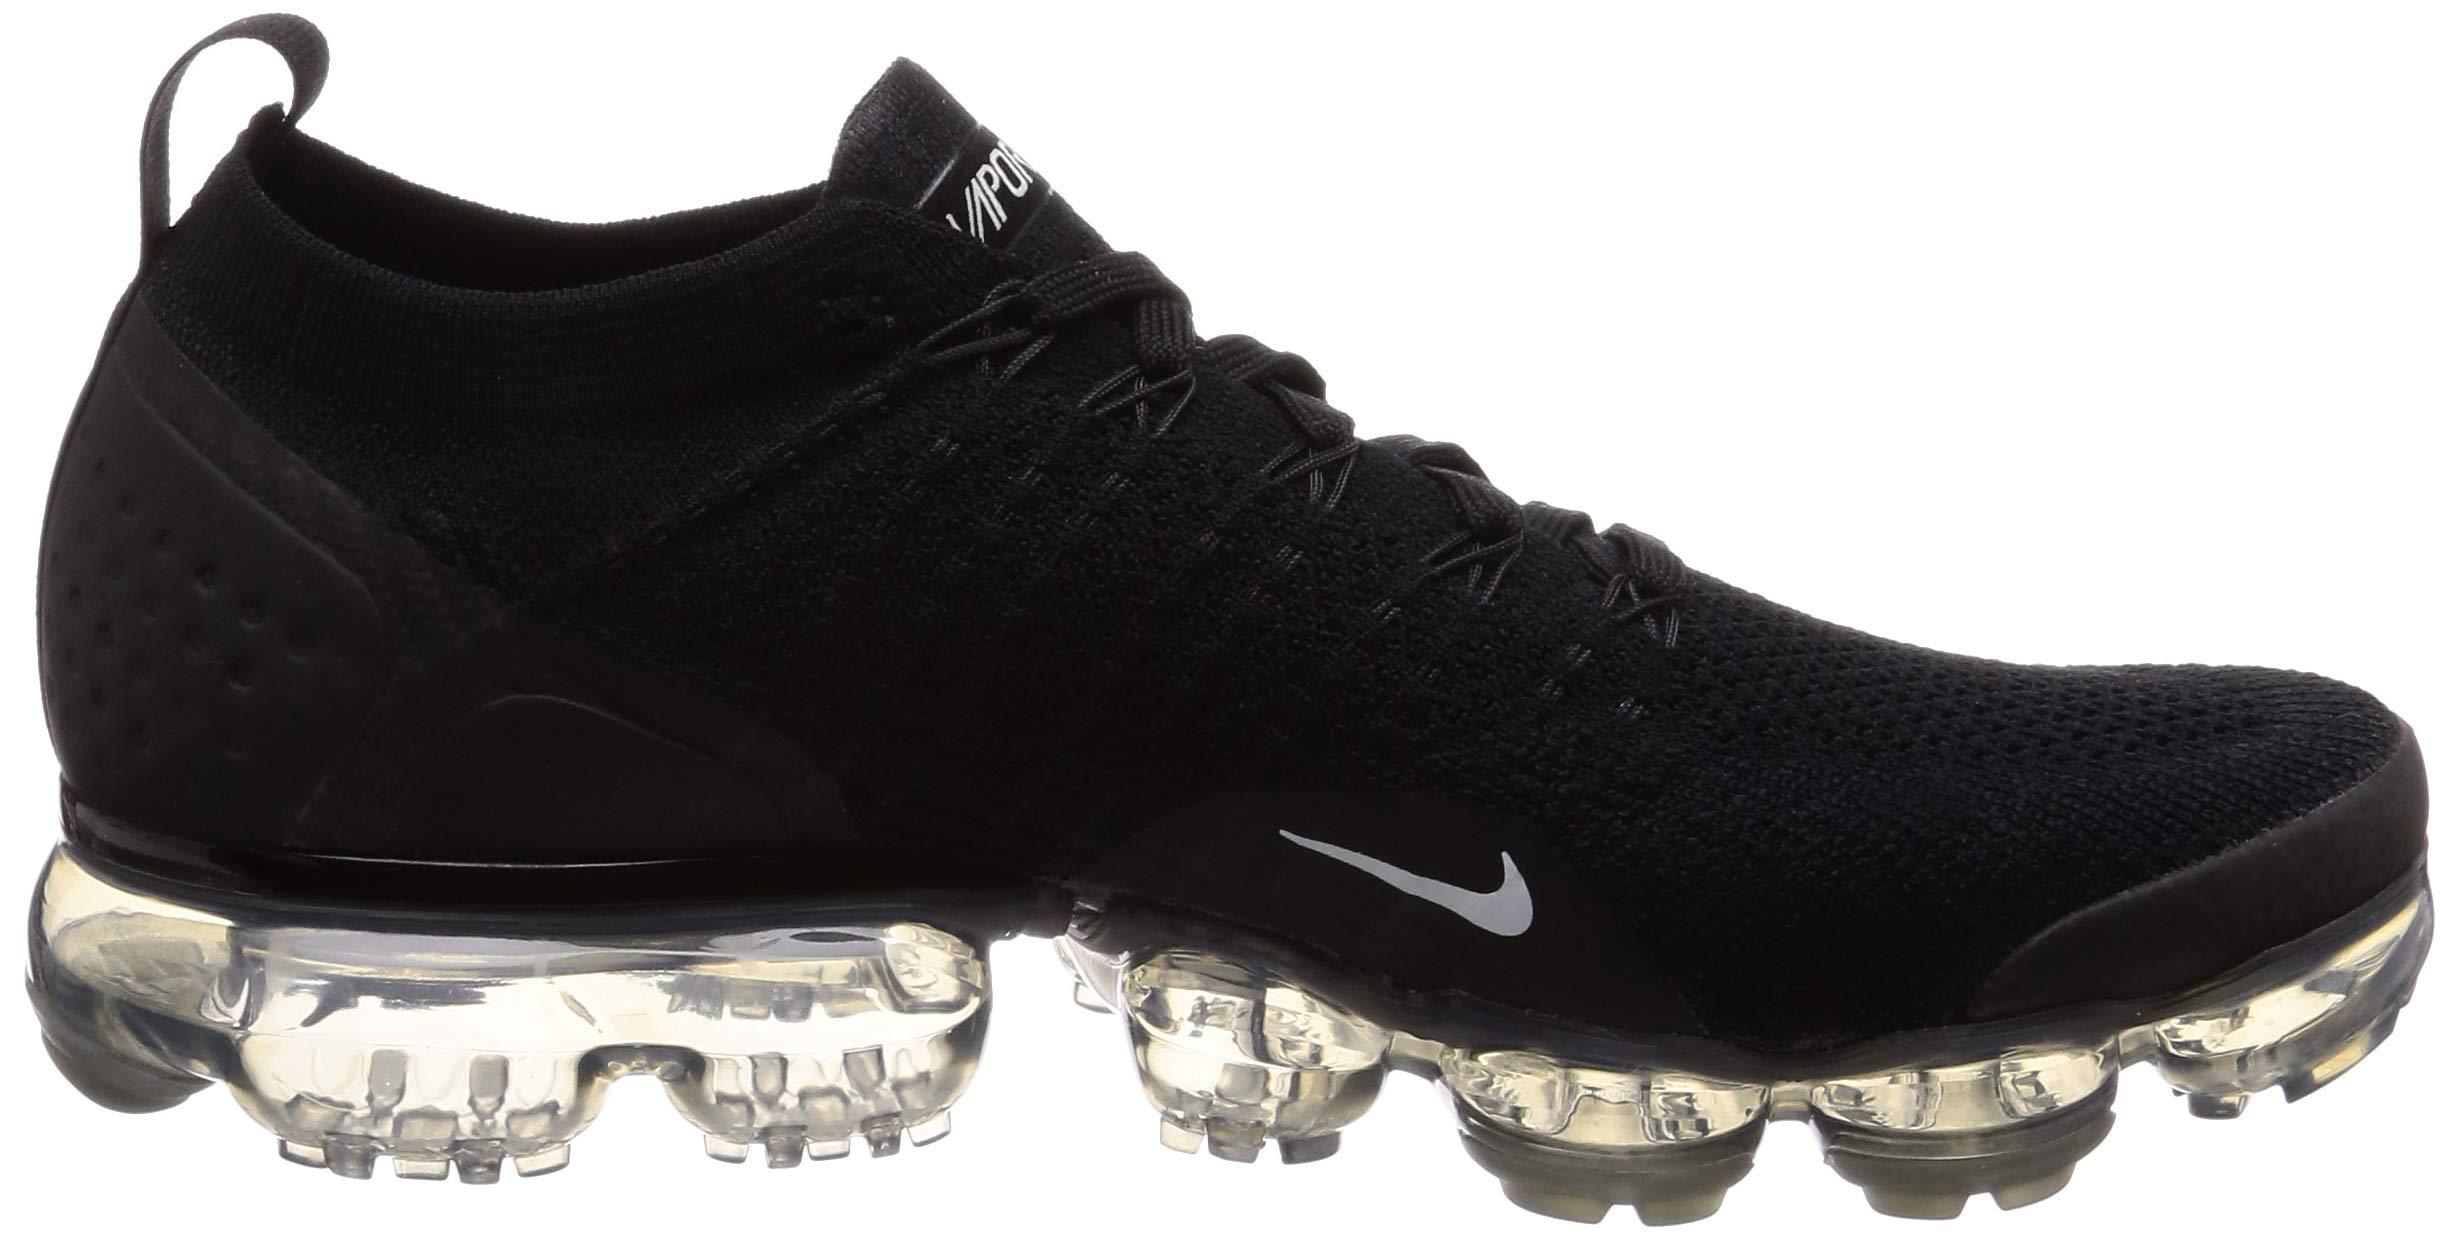 71cmngJ8gEL - Nike Men's Air Vapormax Flyknit 2 Low-Top Sneakers